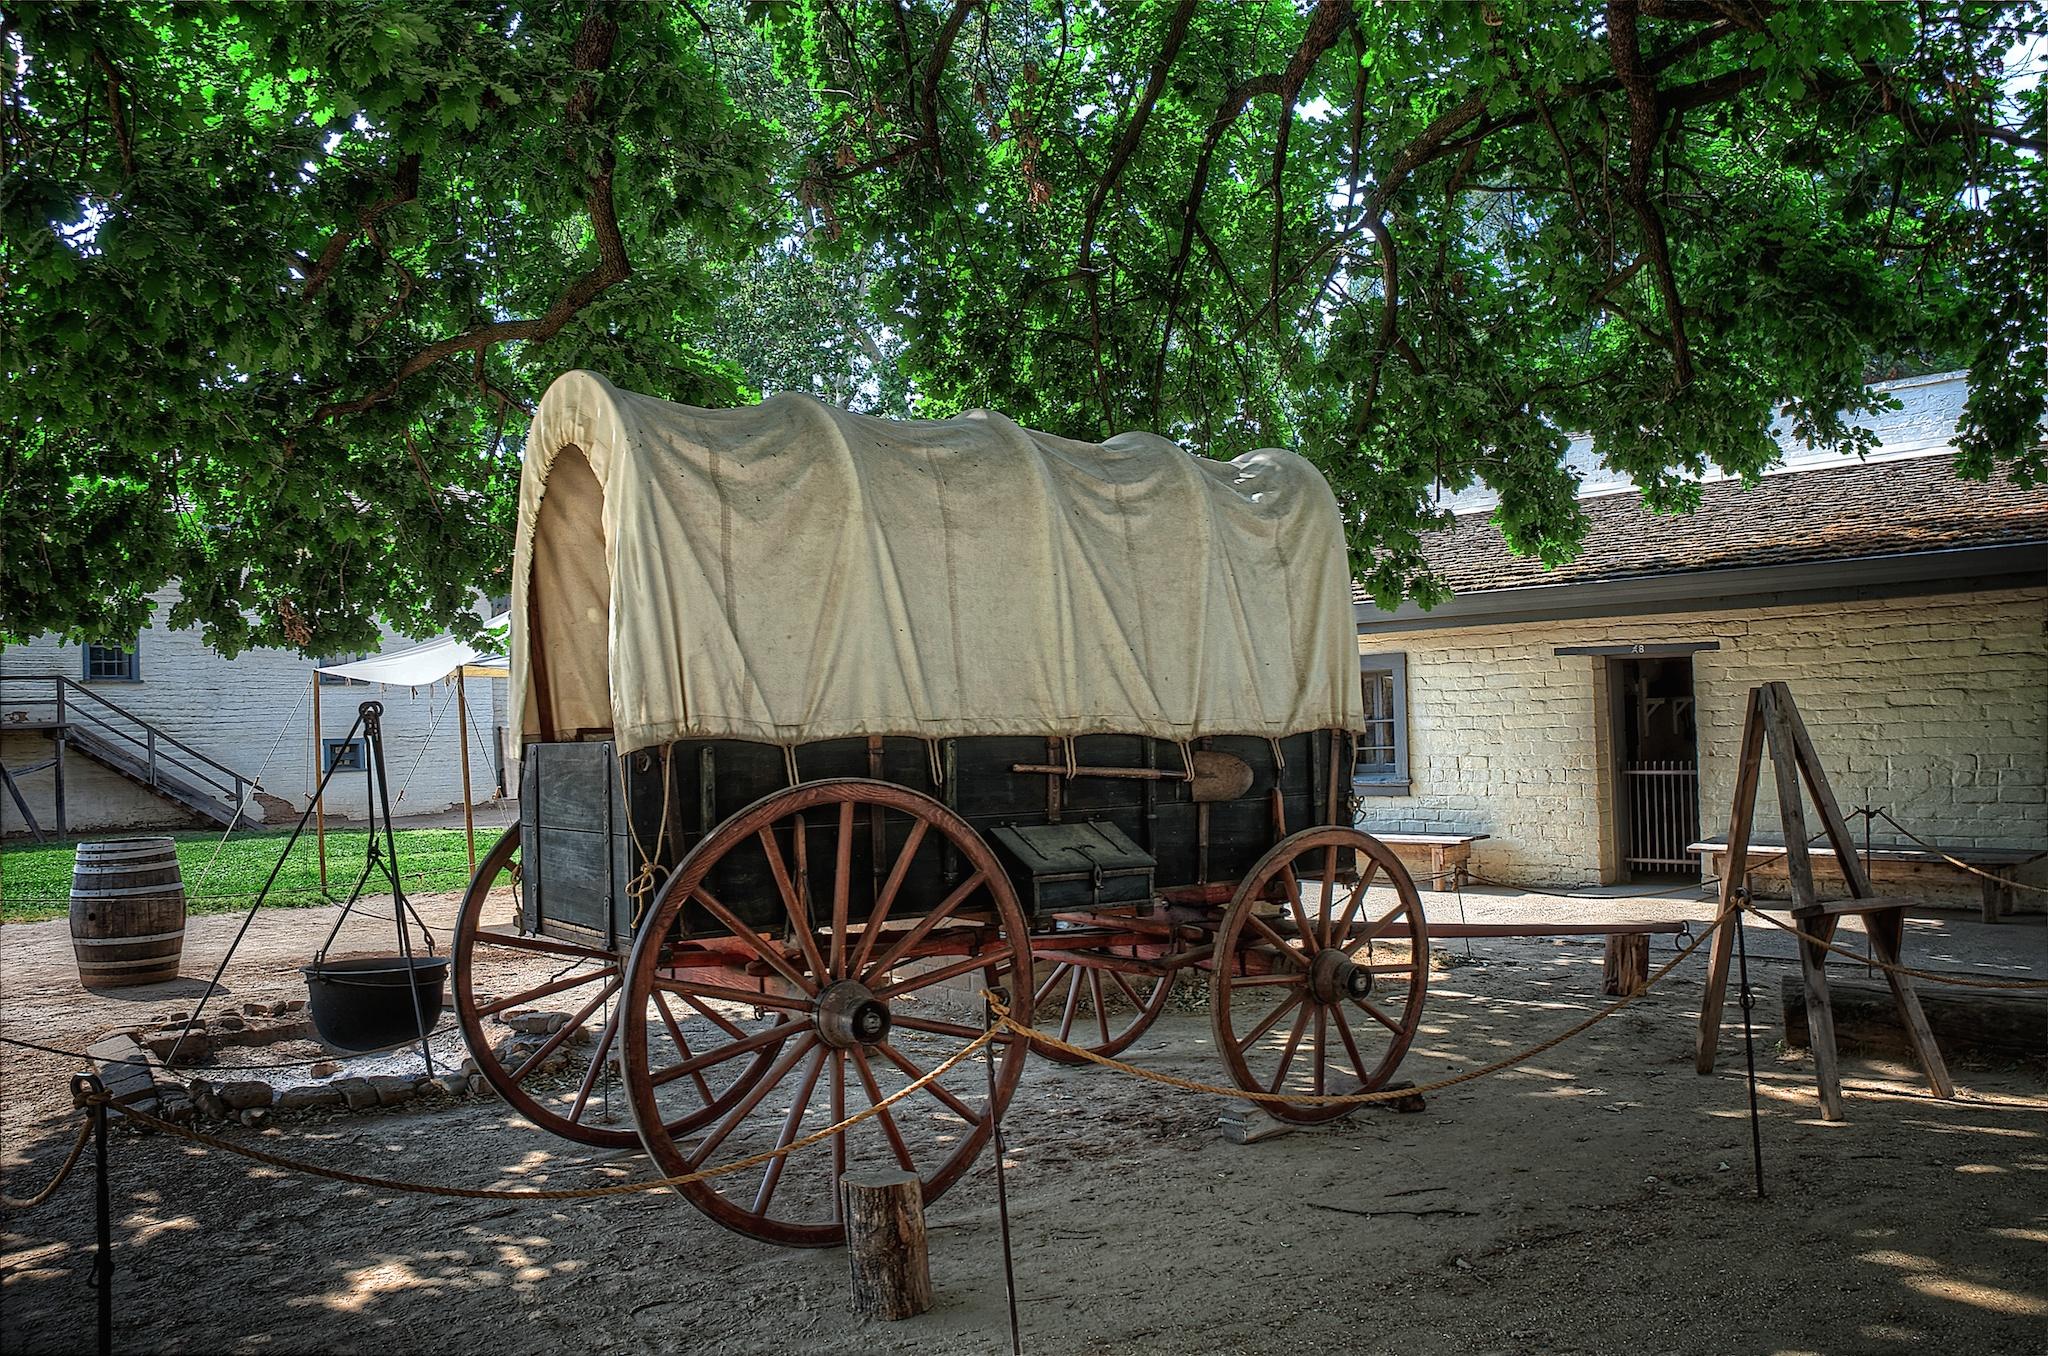 Stagecoach, Sutter's Fort, Sacramento, California